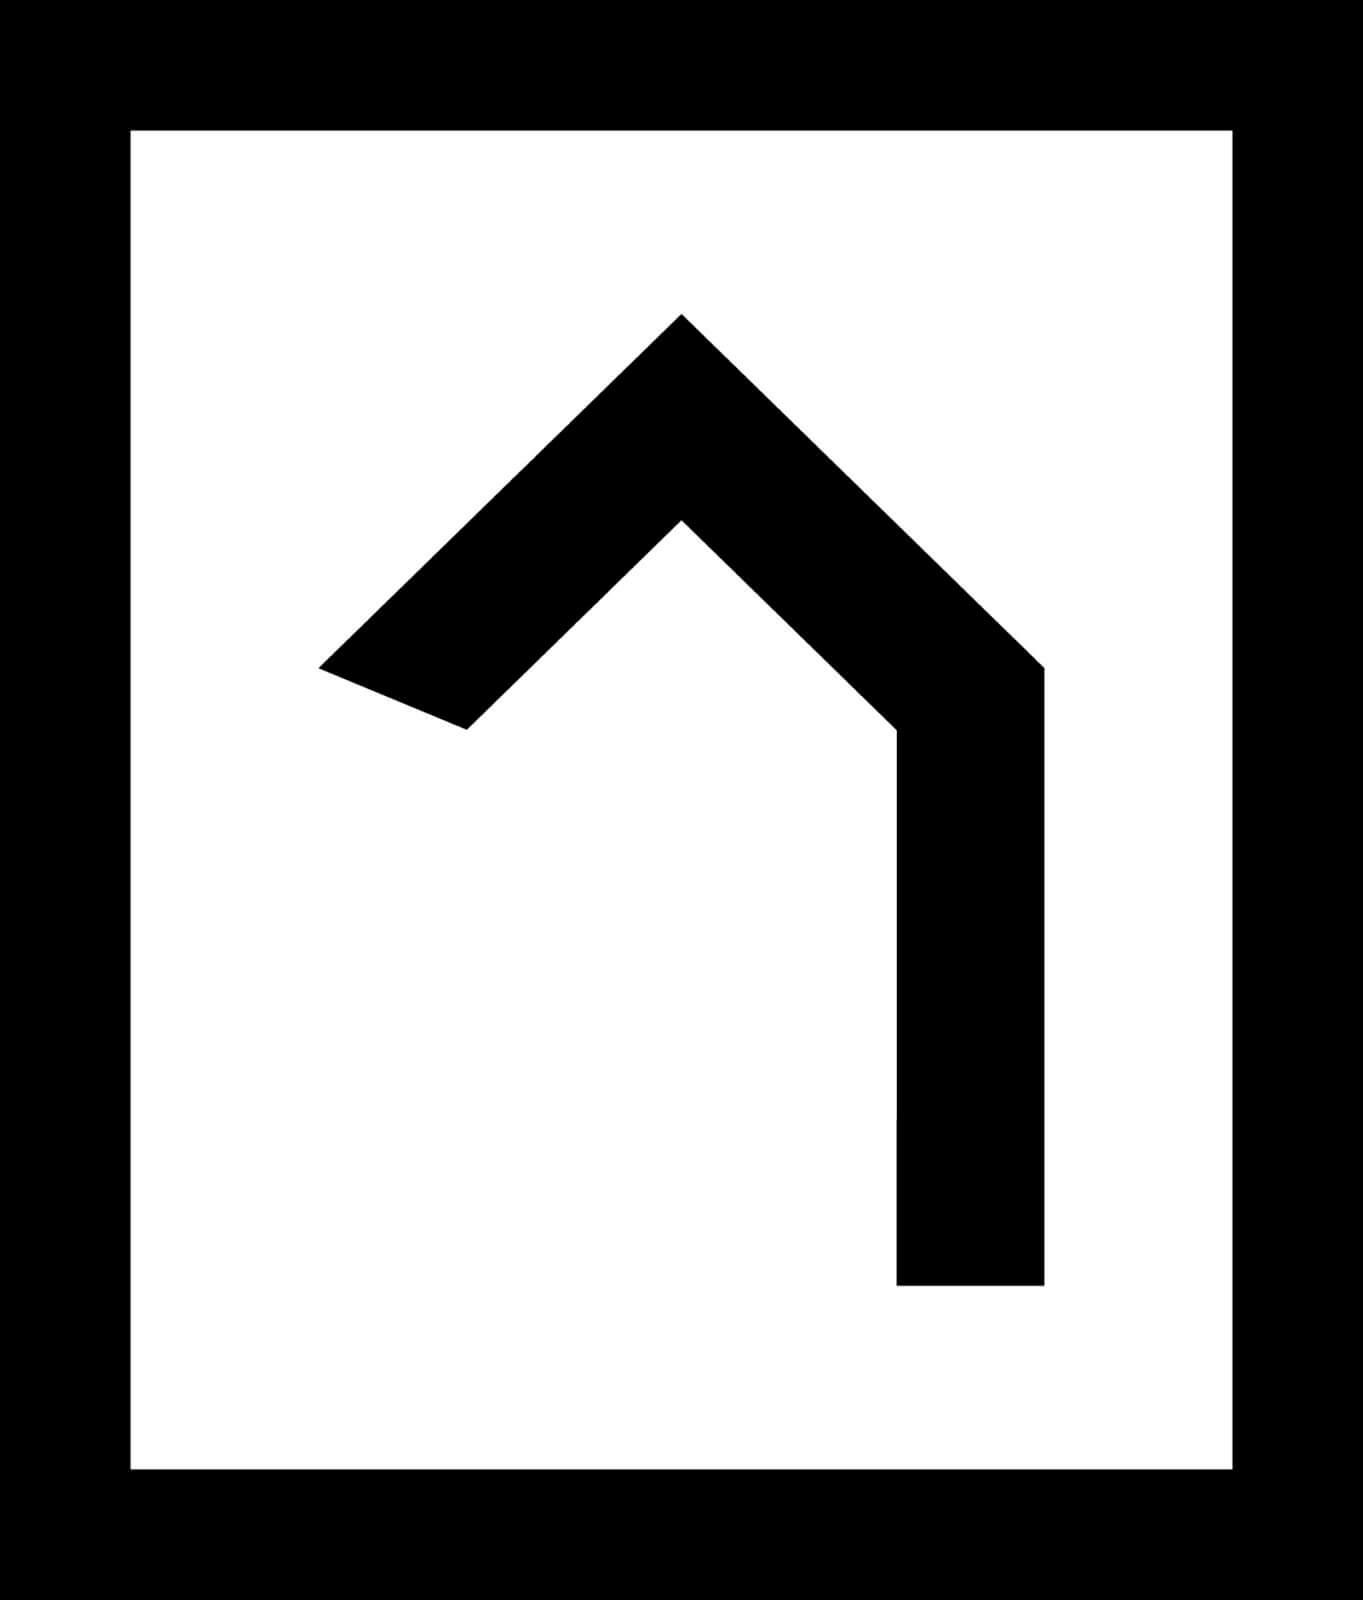 The Cape loft logo